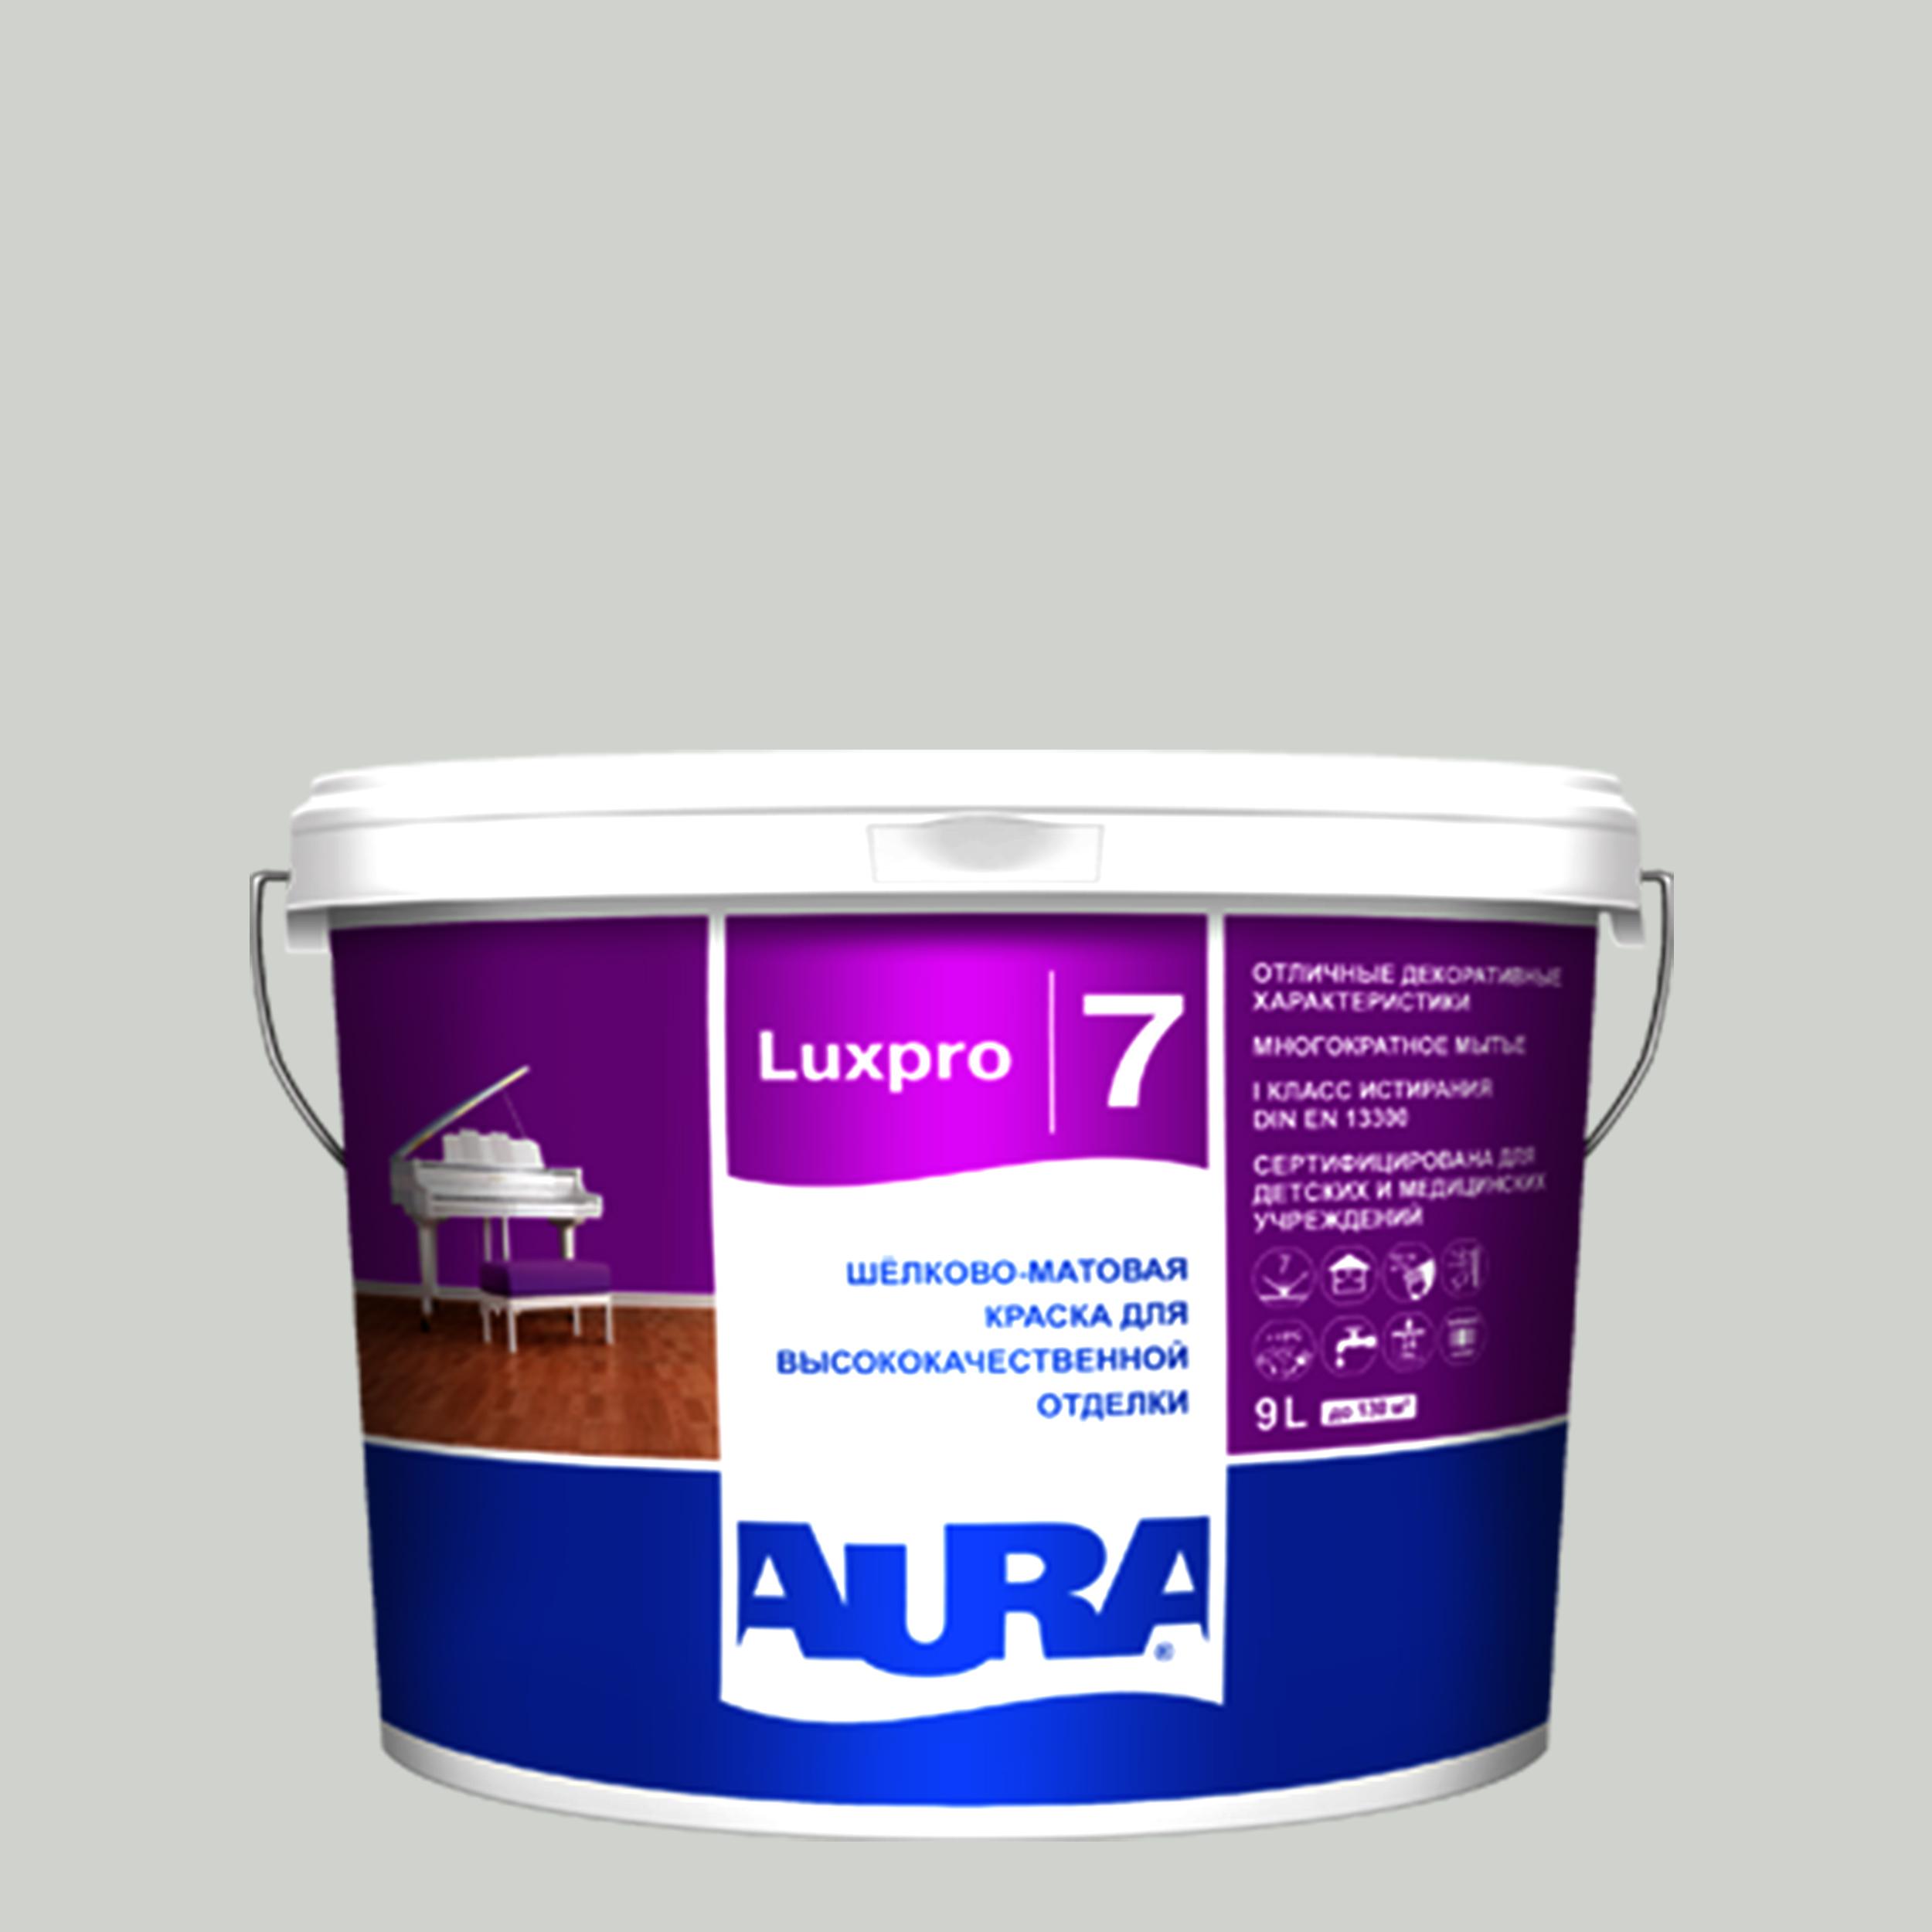 Фото 4 - Краска интерьерная, Aura LuxPRO 7, RAL 7043, 11 кг.